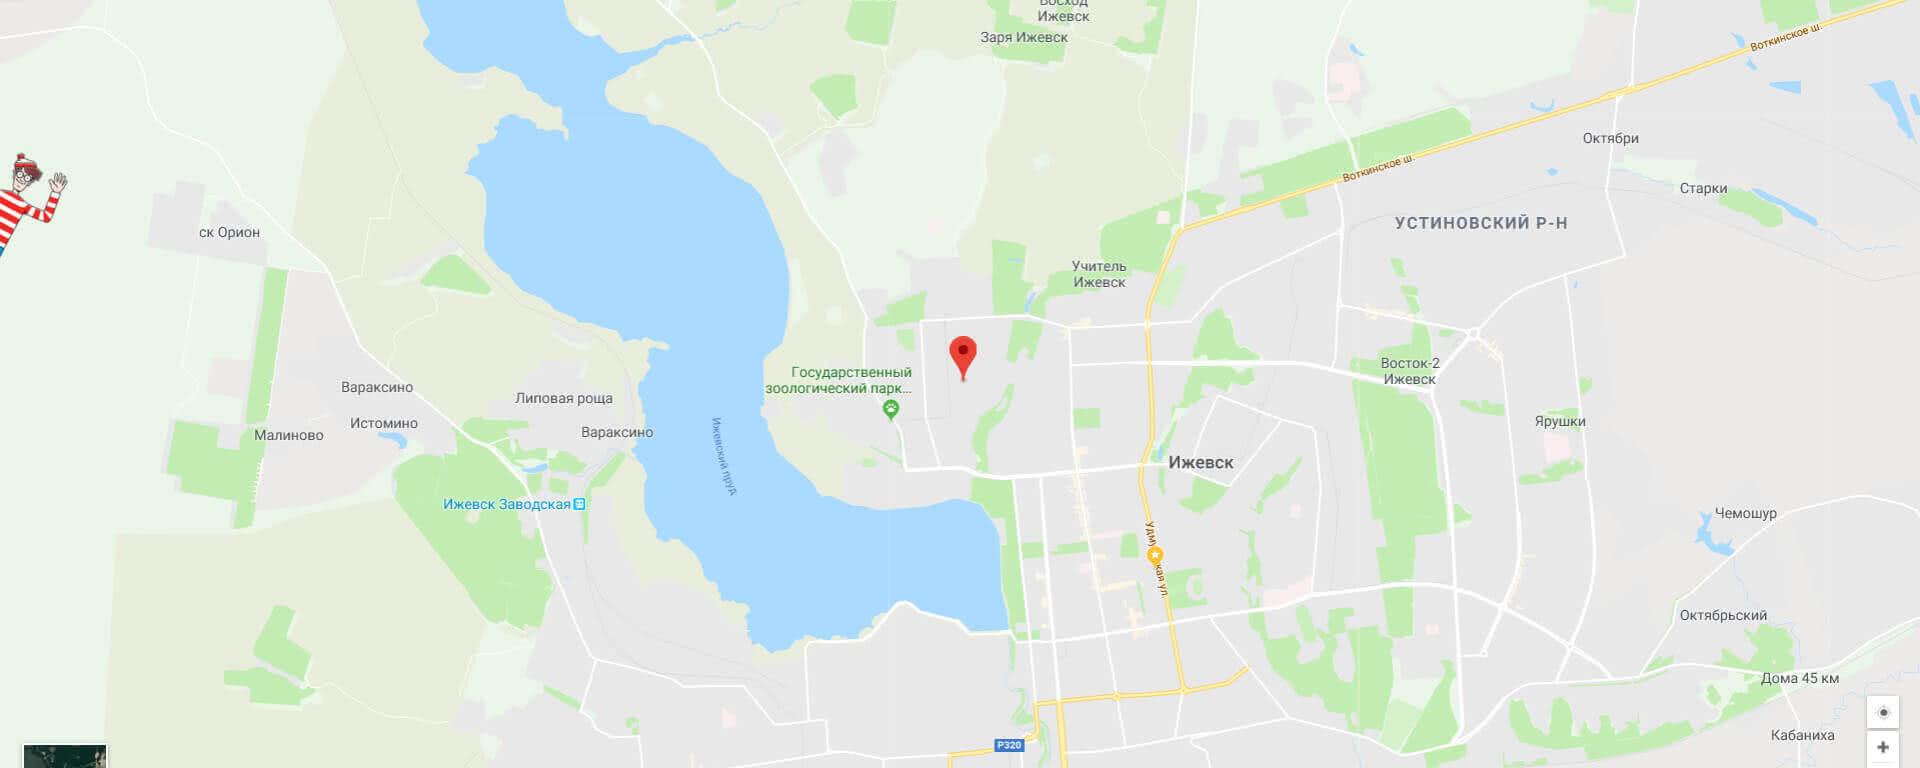 Карта Ижевска